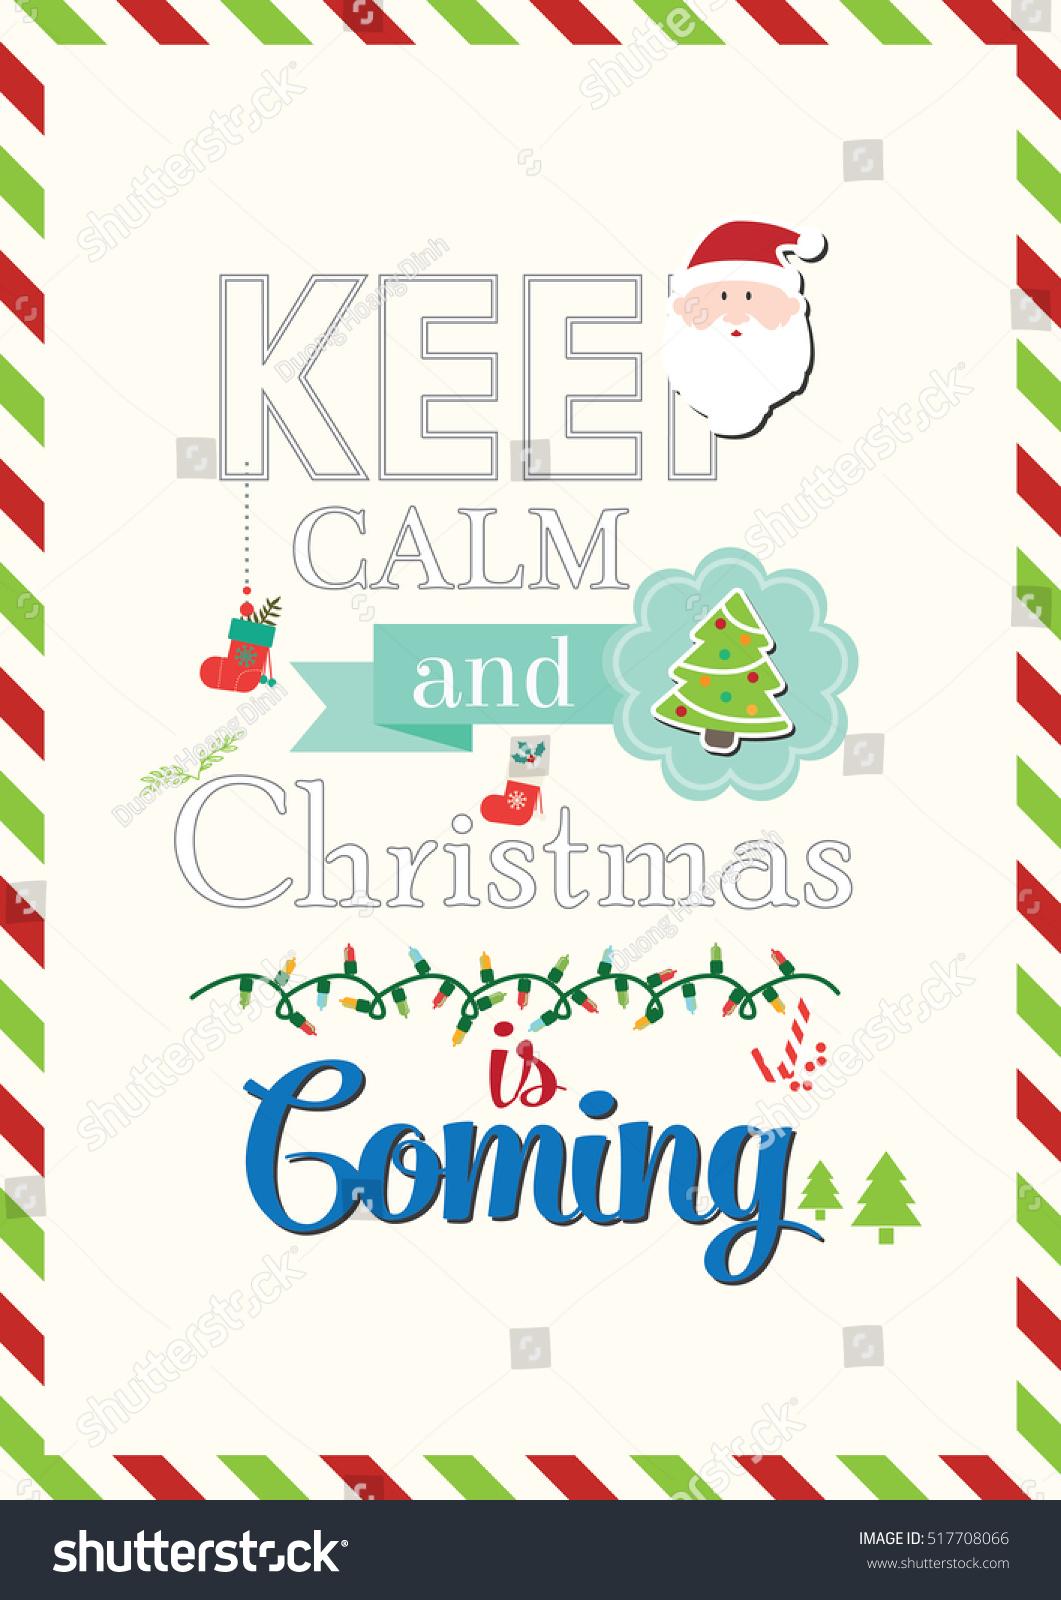 Keep Calm Christmas Is Coming.Christmas Quote Keep Calm Christmas Coming Stock Vector